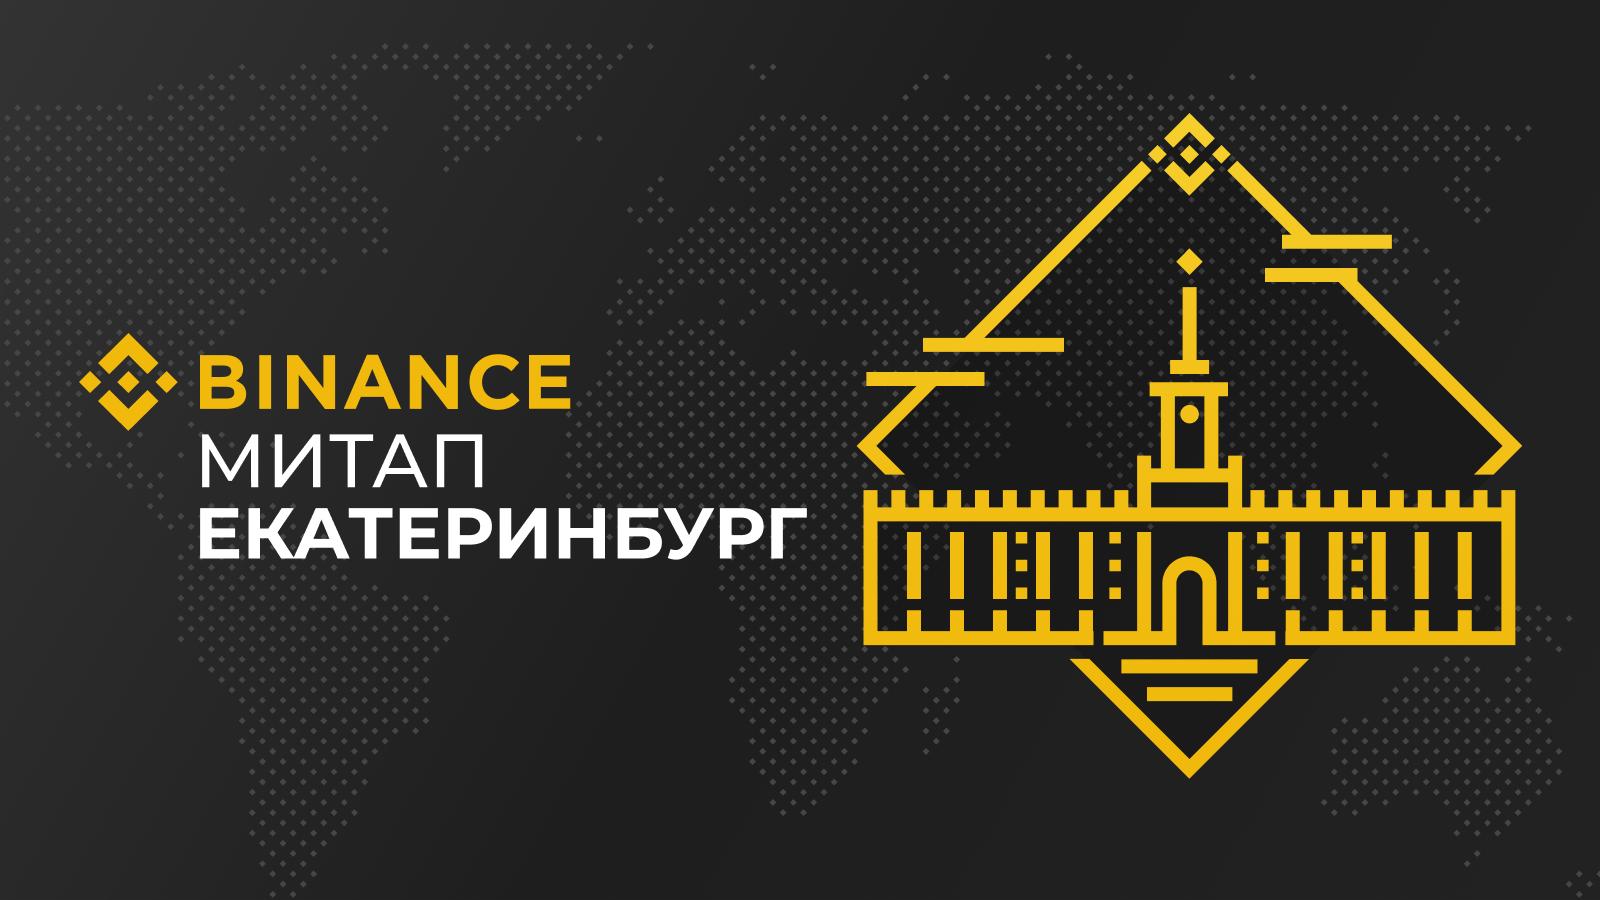 Митап Binance в Екатеринбурге